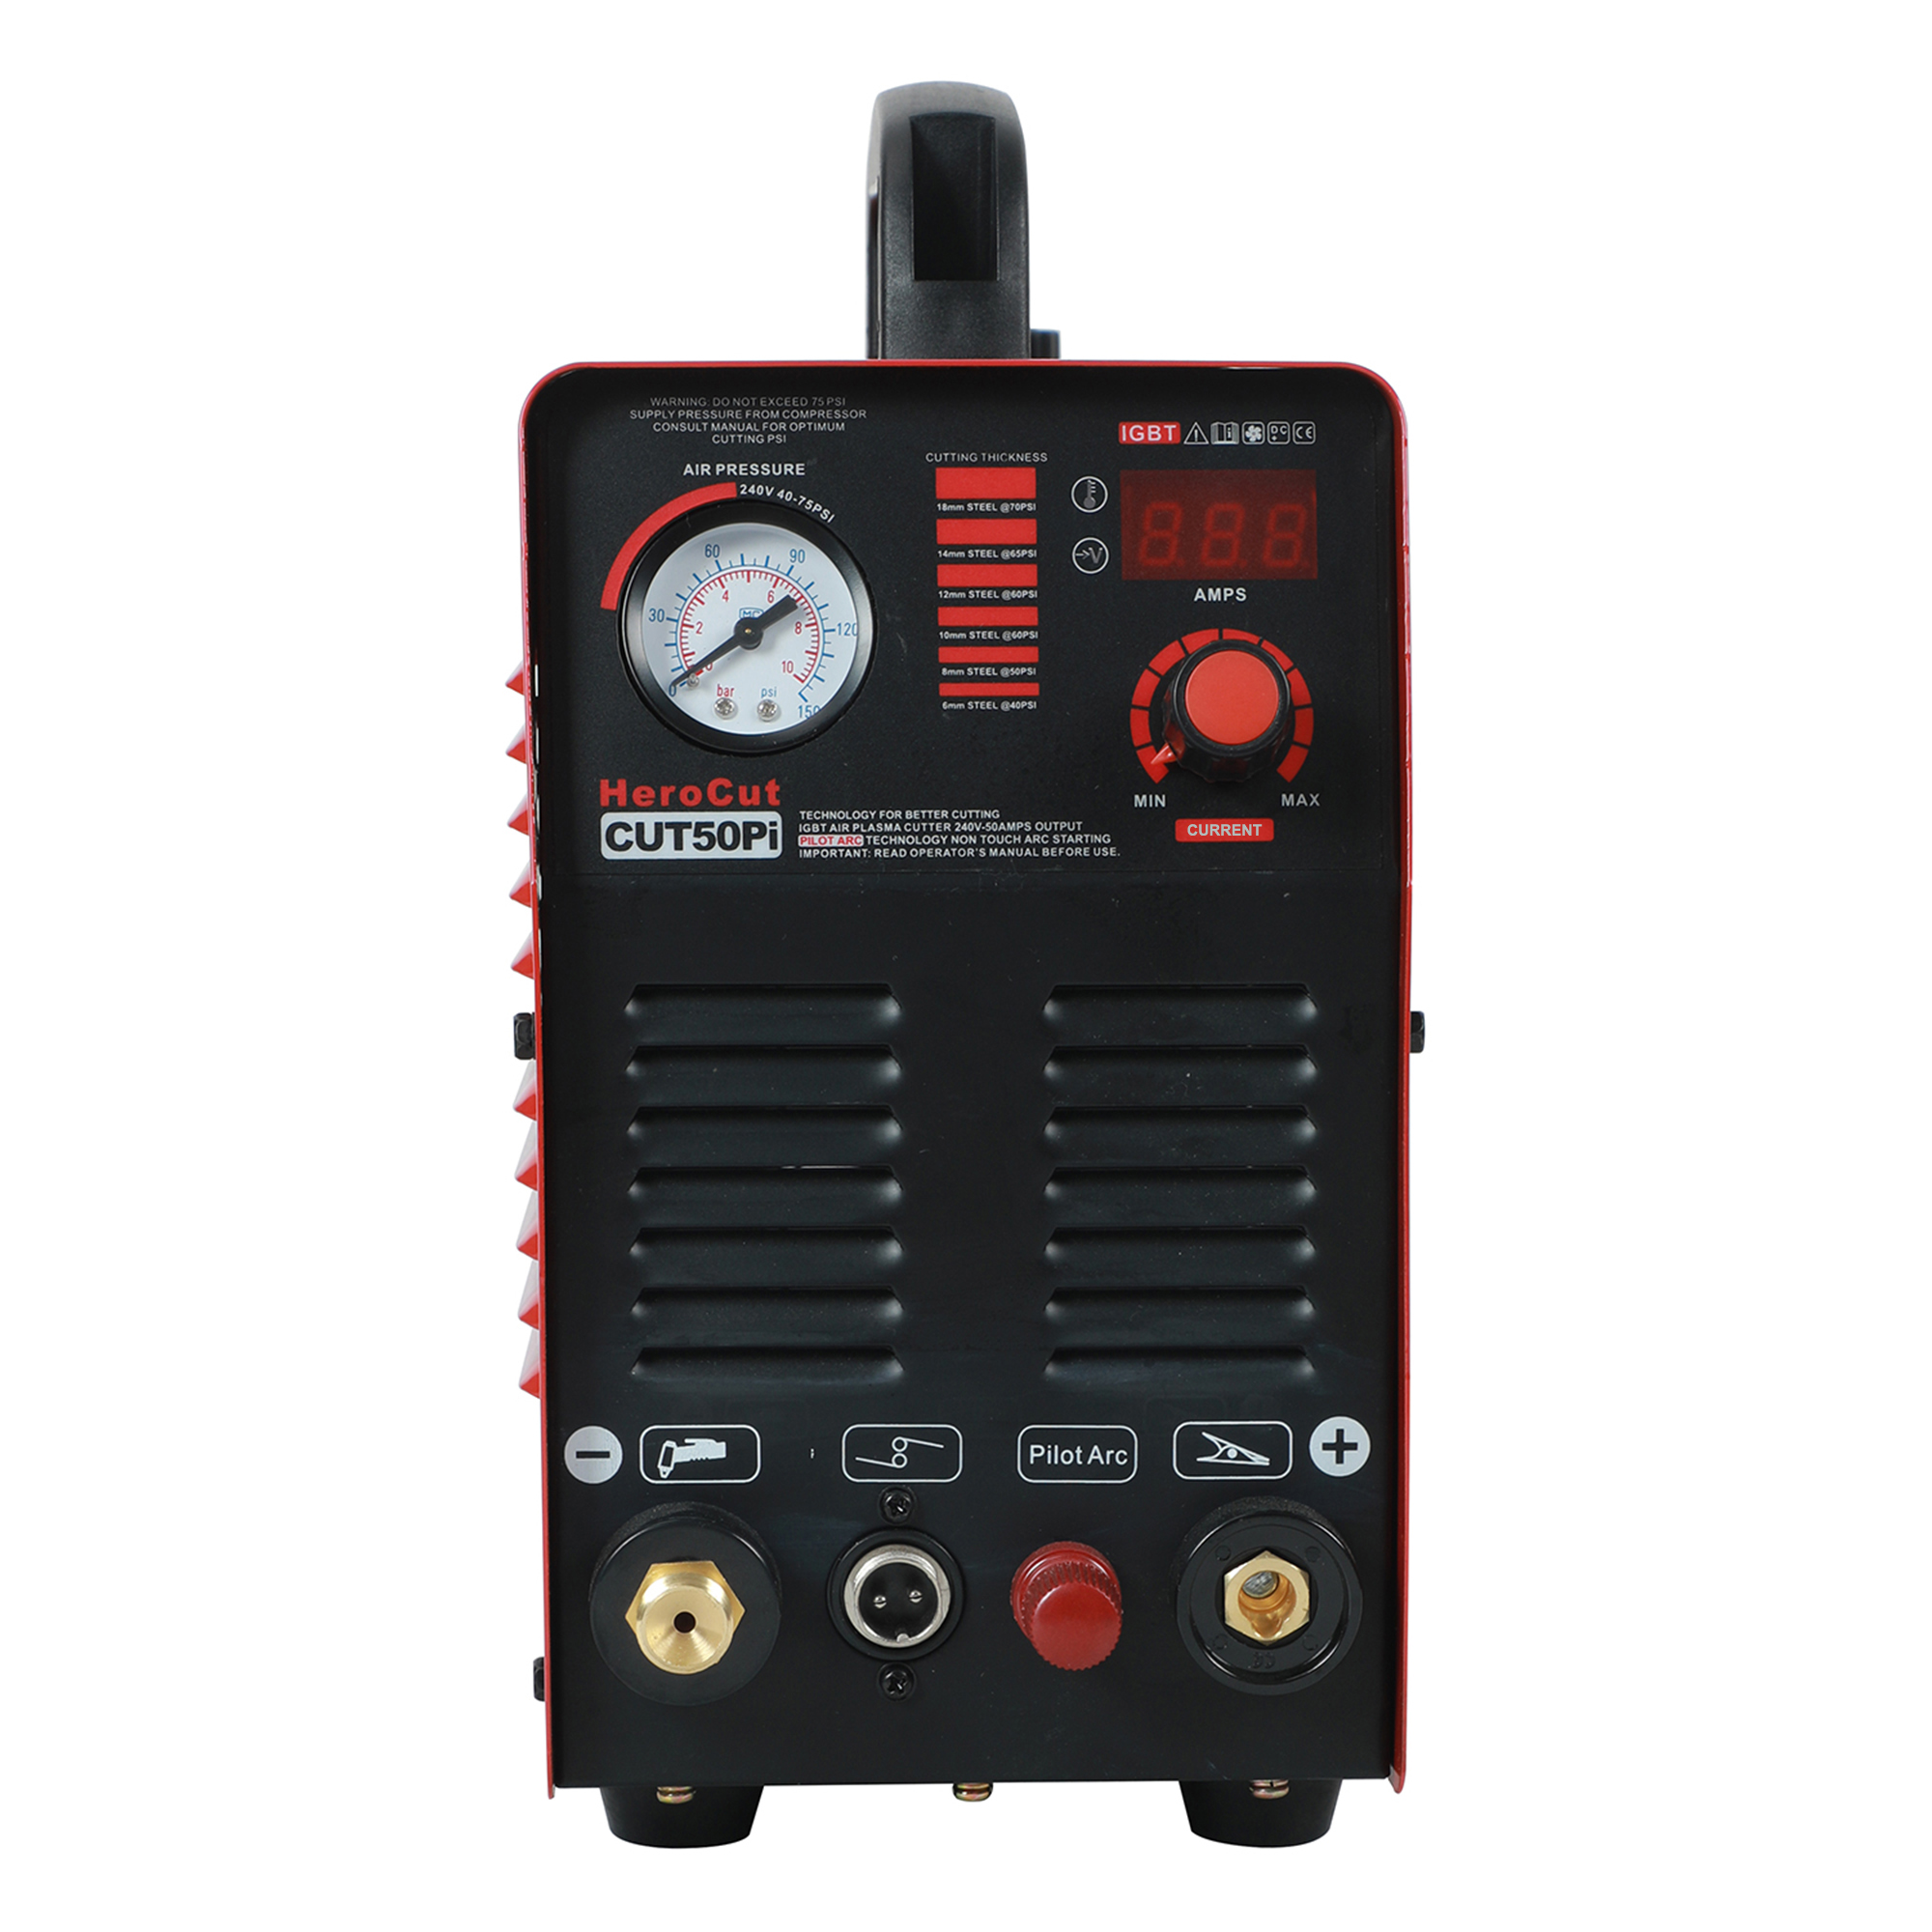 Tools : IGBT Pilot Arc HF DC Air Plasma cutting machine Herocut CUT50Pi 50Amps plasma Cutter Cutting Thickness14mm Clean Cut